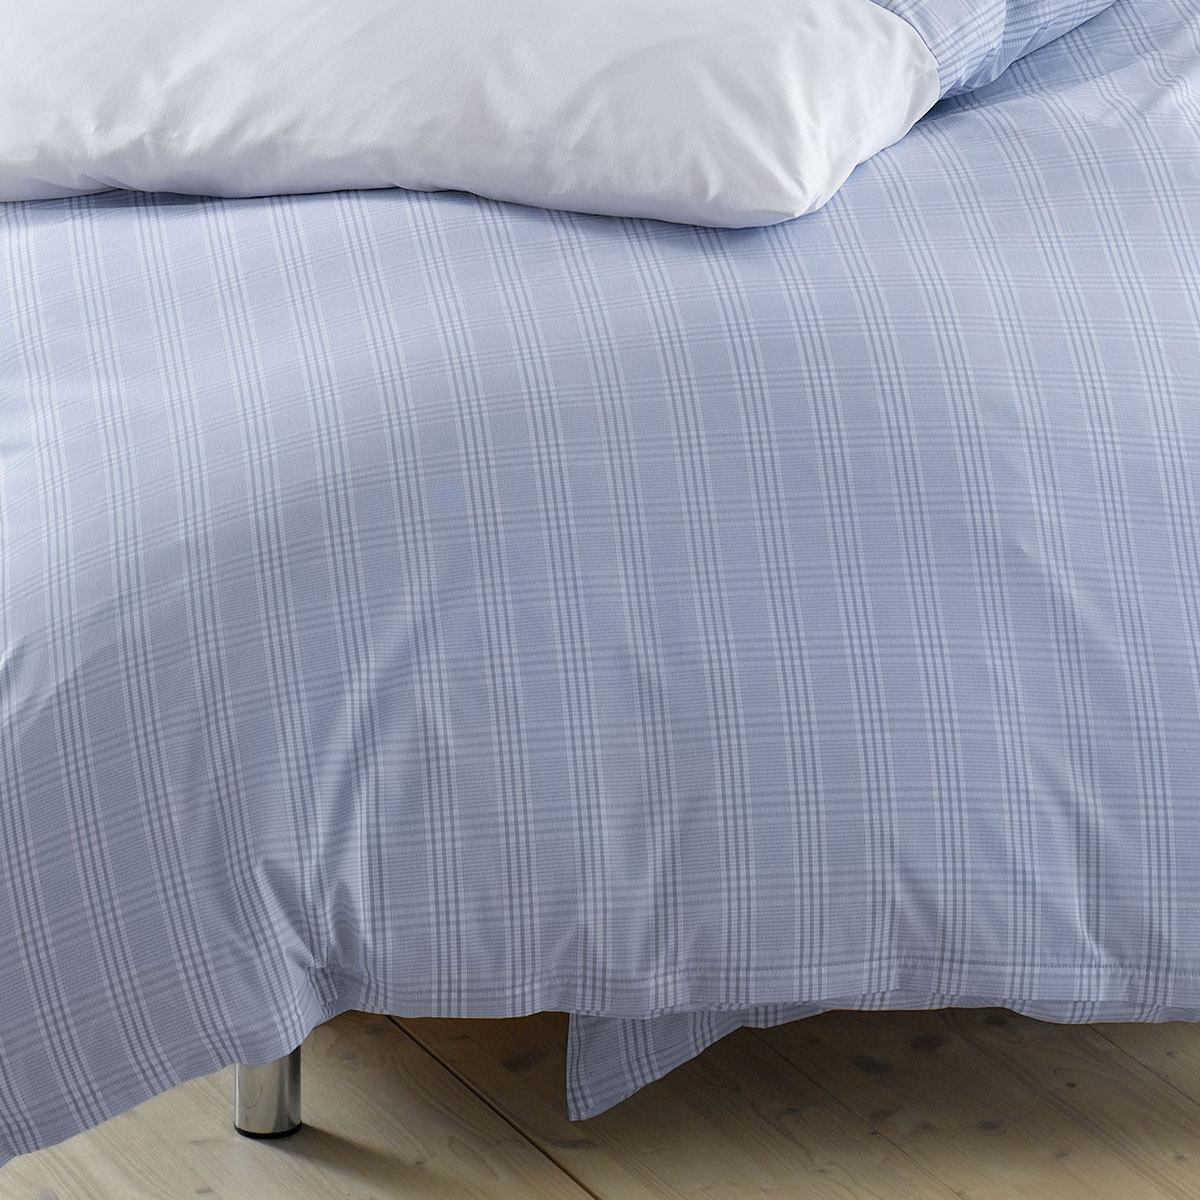 lorena mako perkal bettw sche denver bleu g nstig online kaufen bei bettwaren shop. Black Bedroom Furniture Sets. Home Design Ideas